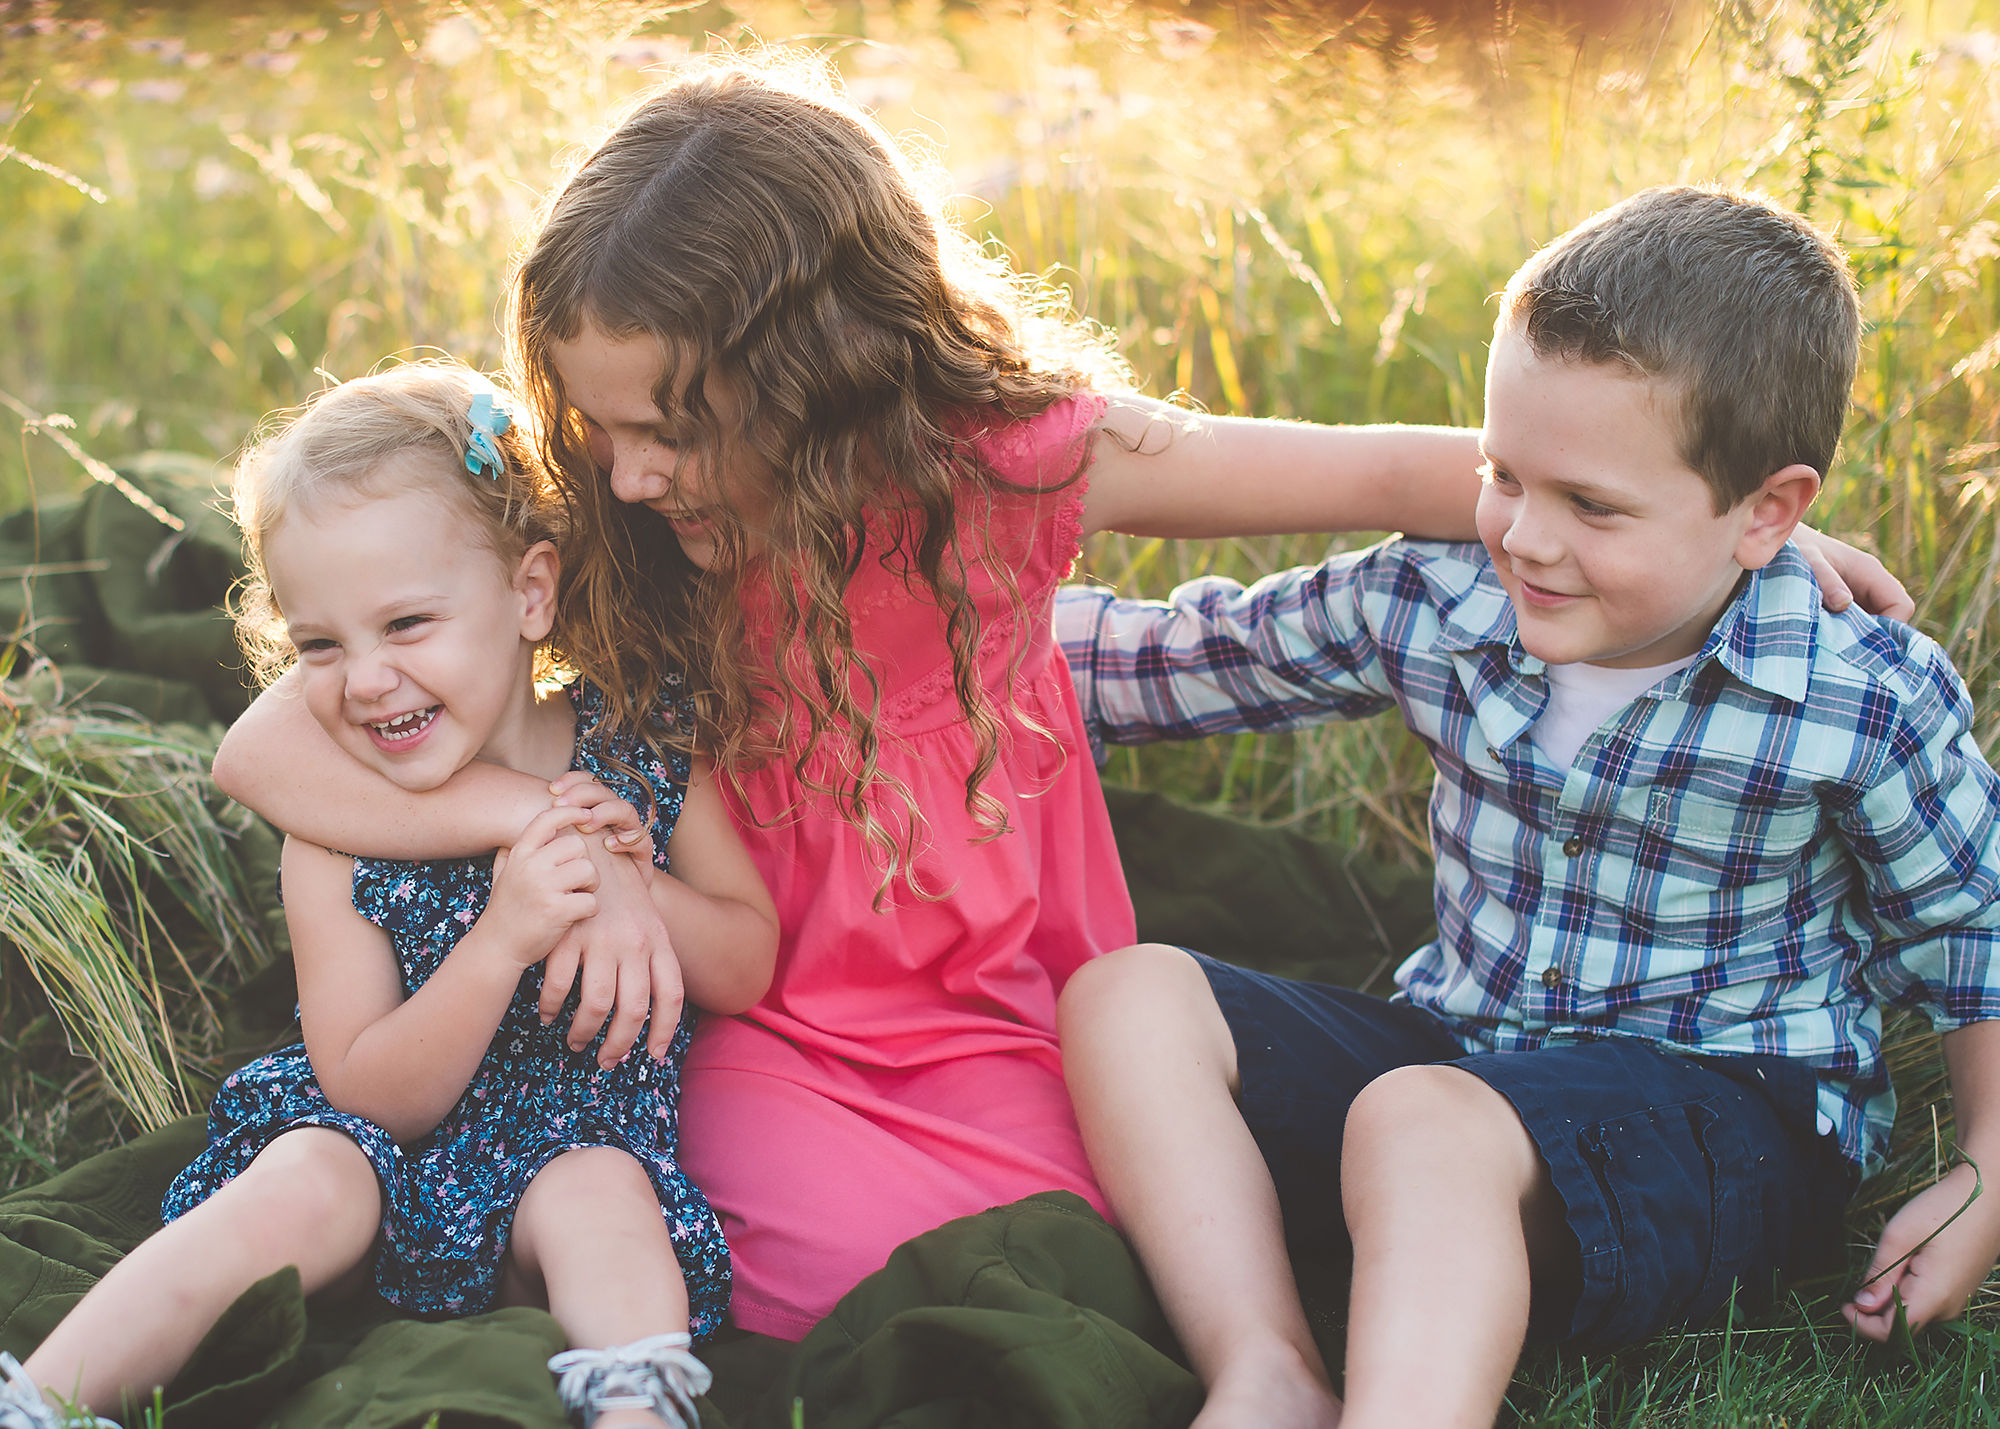 Hinsdale Photography, Hinsdale photographer, hinsdale mini sessions, oak brook mini sessions, family mini sessions, spring mini sessions, summer mini sessions, fall mini sessions_044.jpg